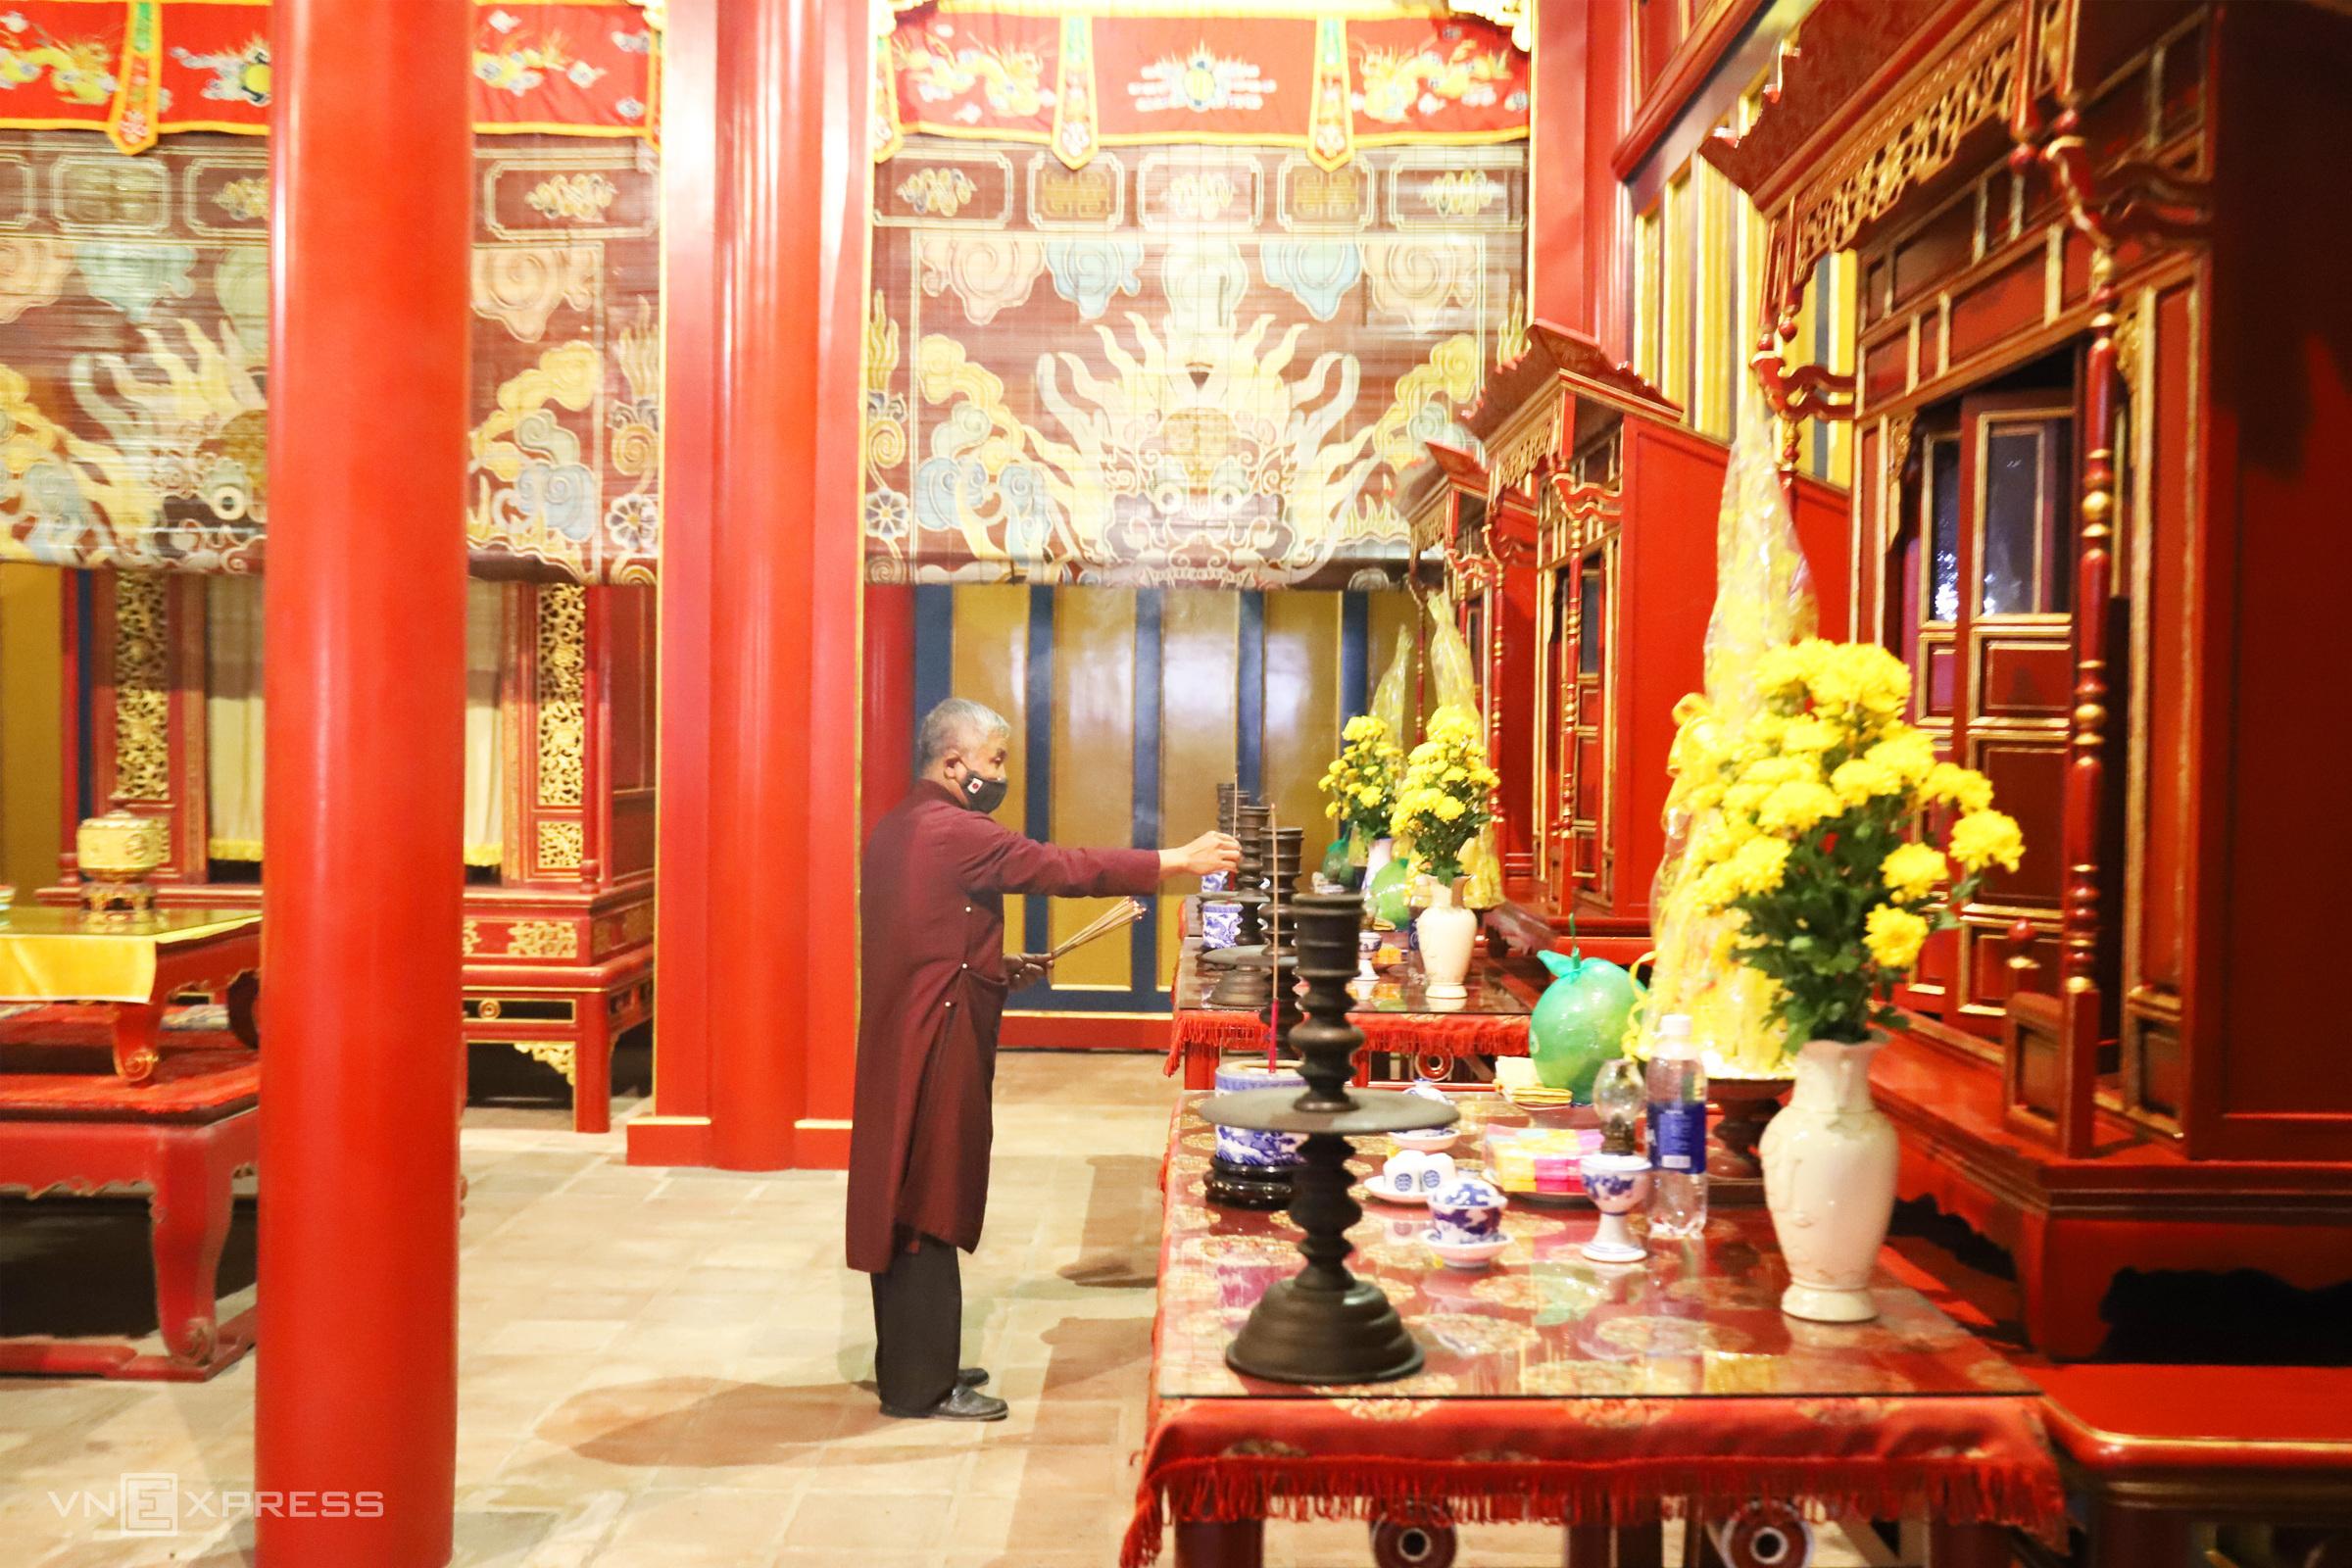 Downgraded Hue temple recalls era of Nguyen Dynasty ancestor worship